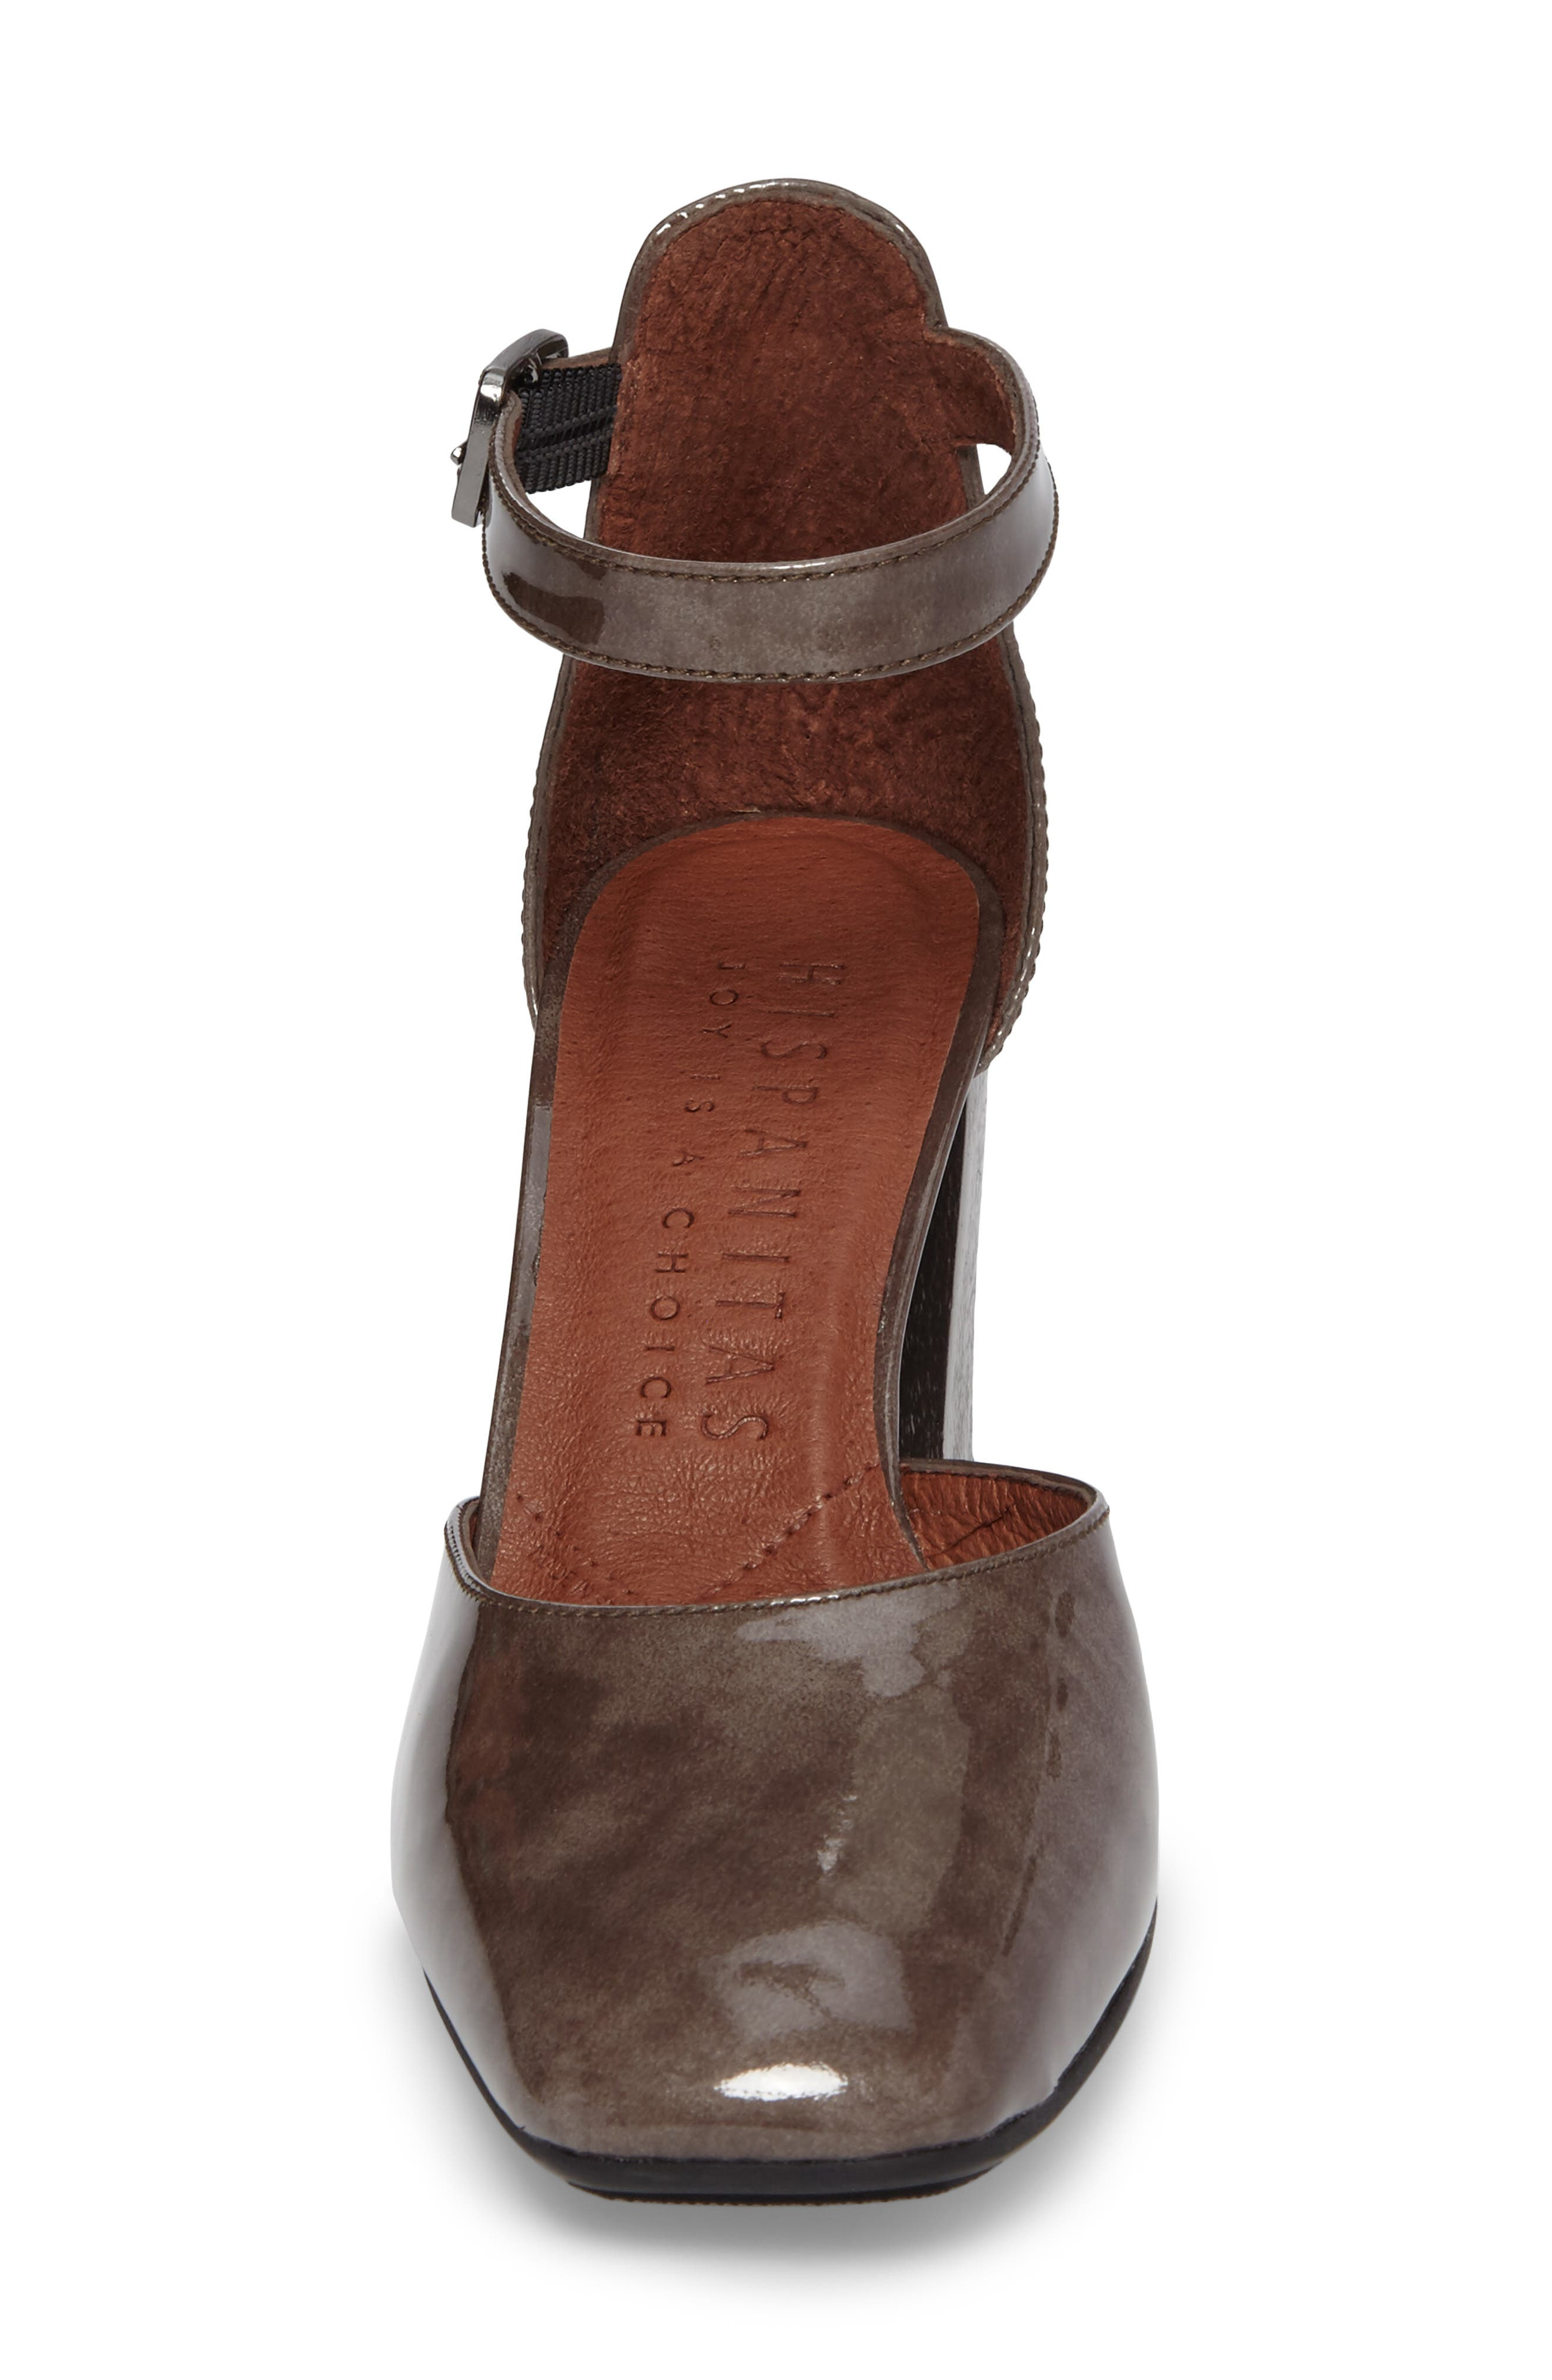 Paulette Flared Heel Pump,                             Alternate thumbnail 4, color,                             Vision Leather